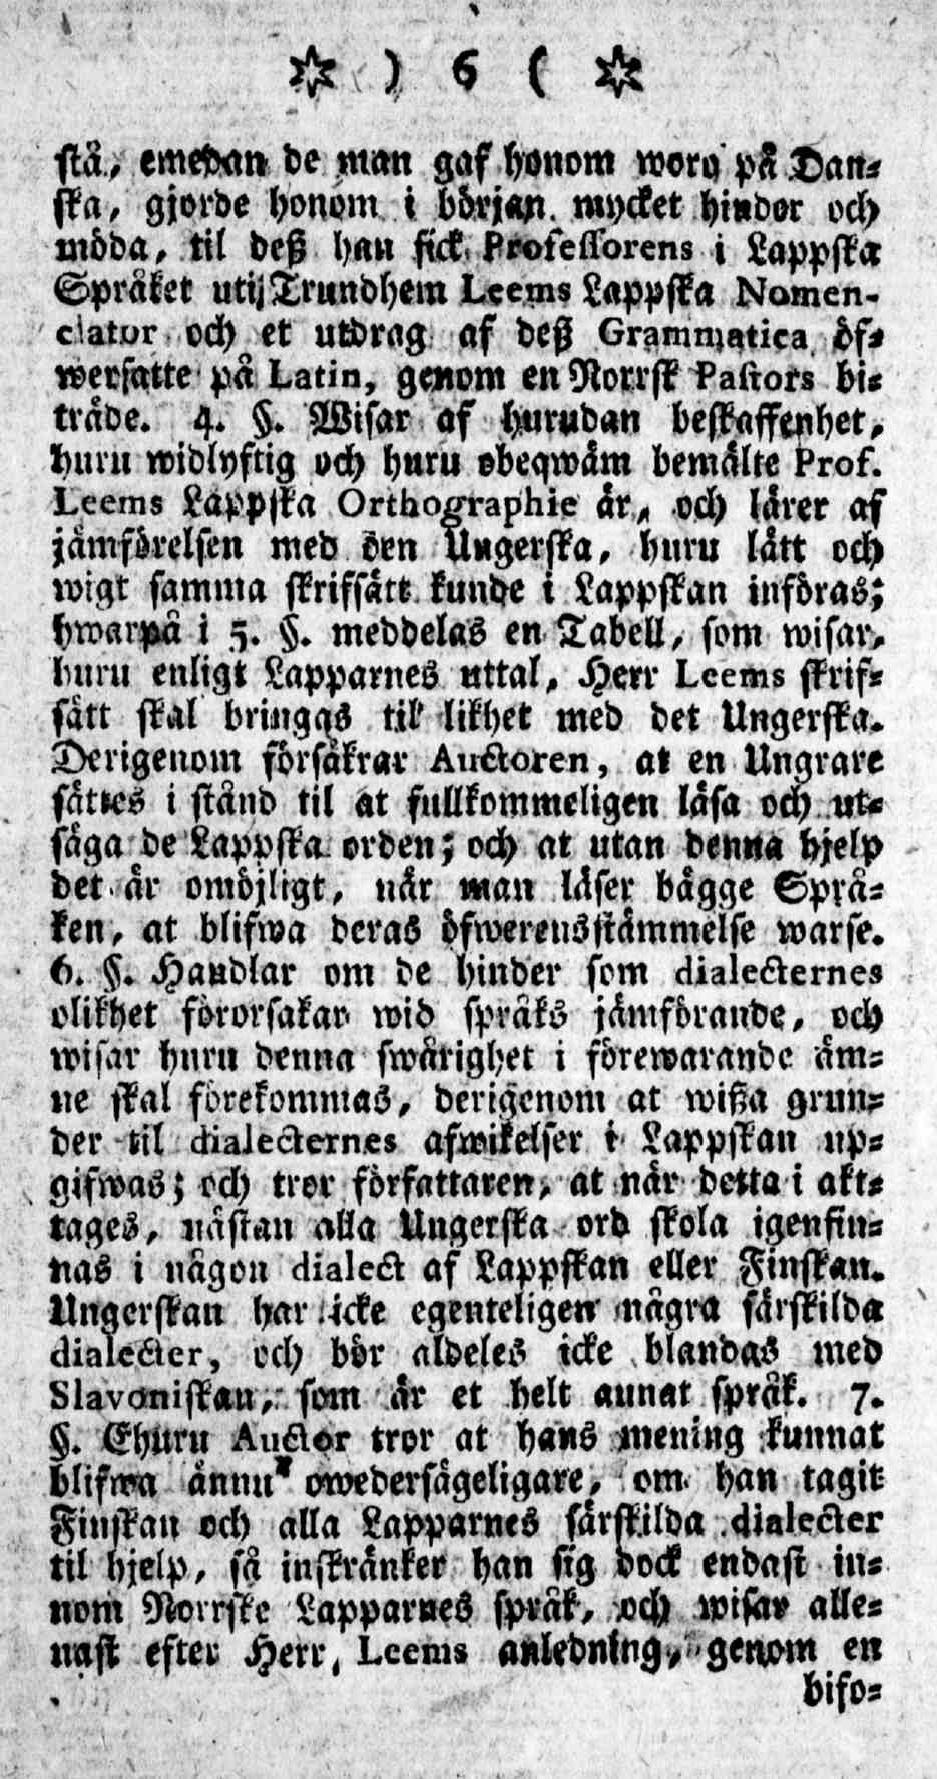 Tidningar Utgifne af et Sällskap i Åbo, 15.01.1771, nro 1, sivu 6